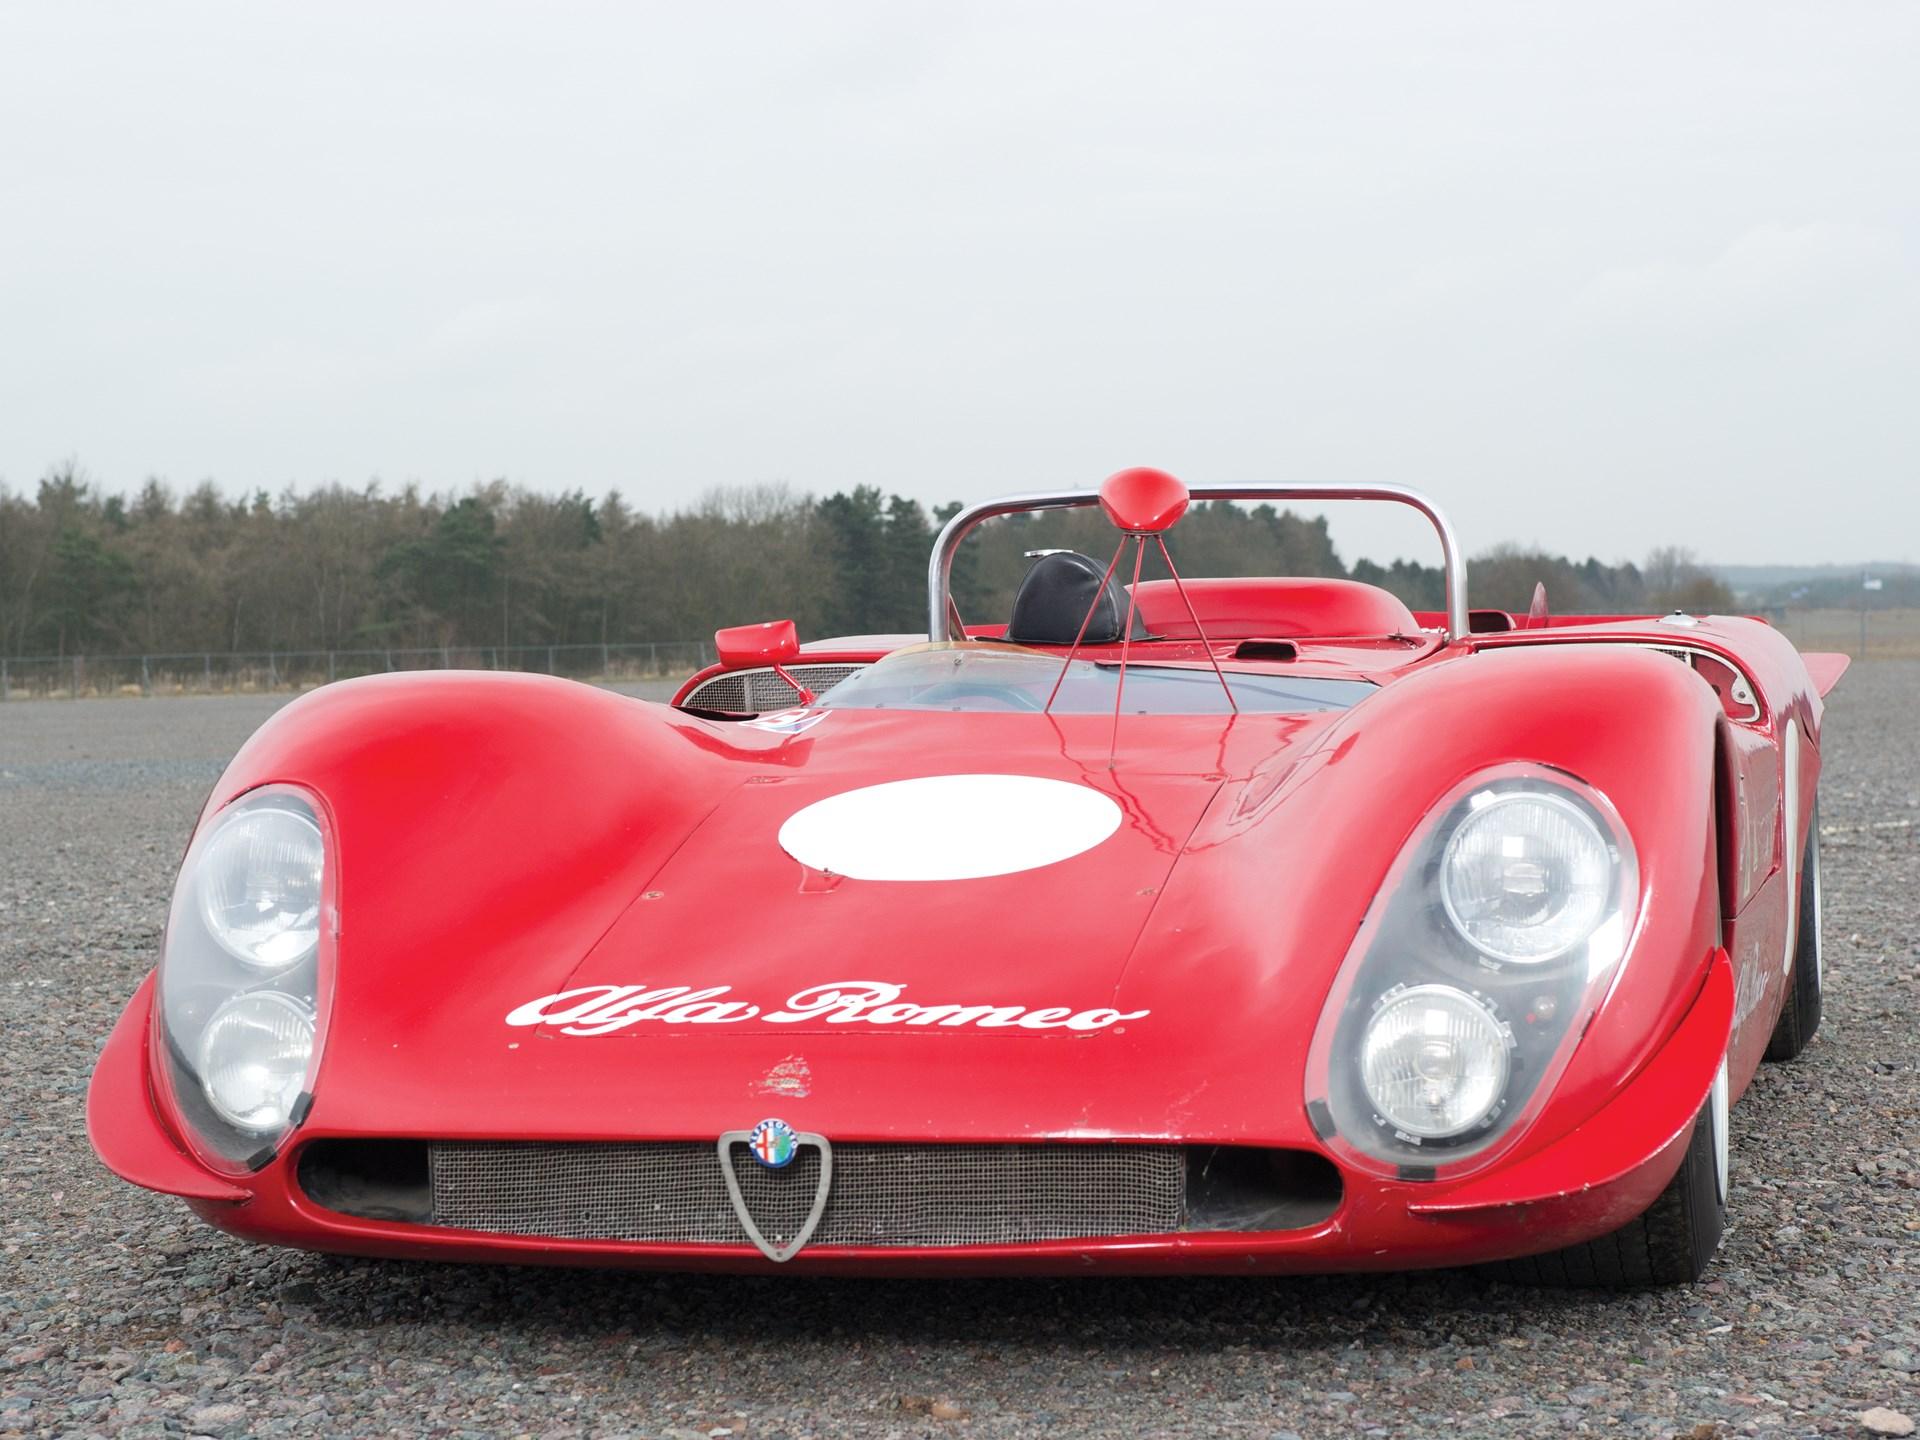 Wiring Harness 1969 Alfa Romeo Trusted Diagram 164 Engine Rm Sothebys Tipo 33 3 Sports Racer Monaco 2012 Beautiful